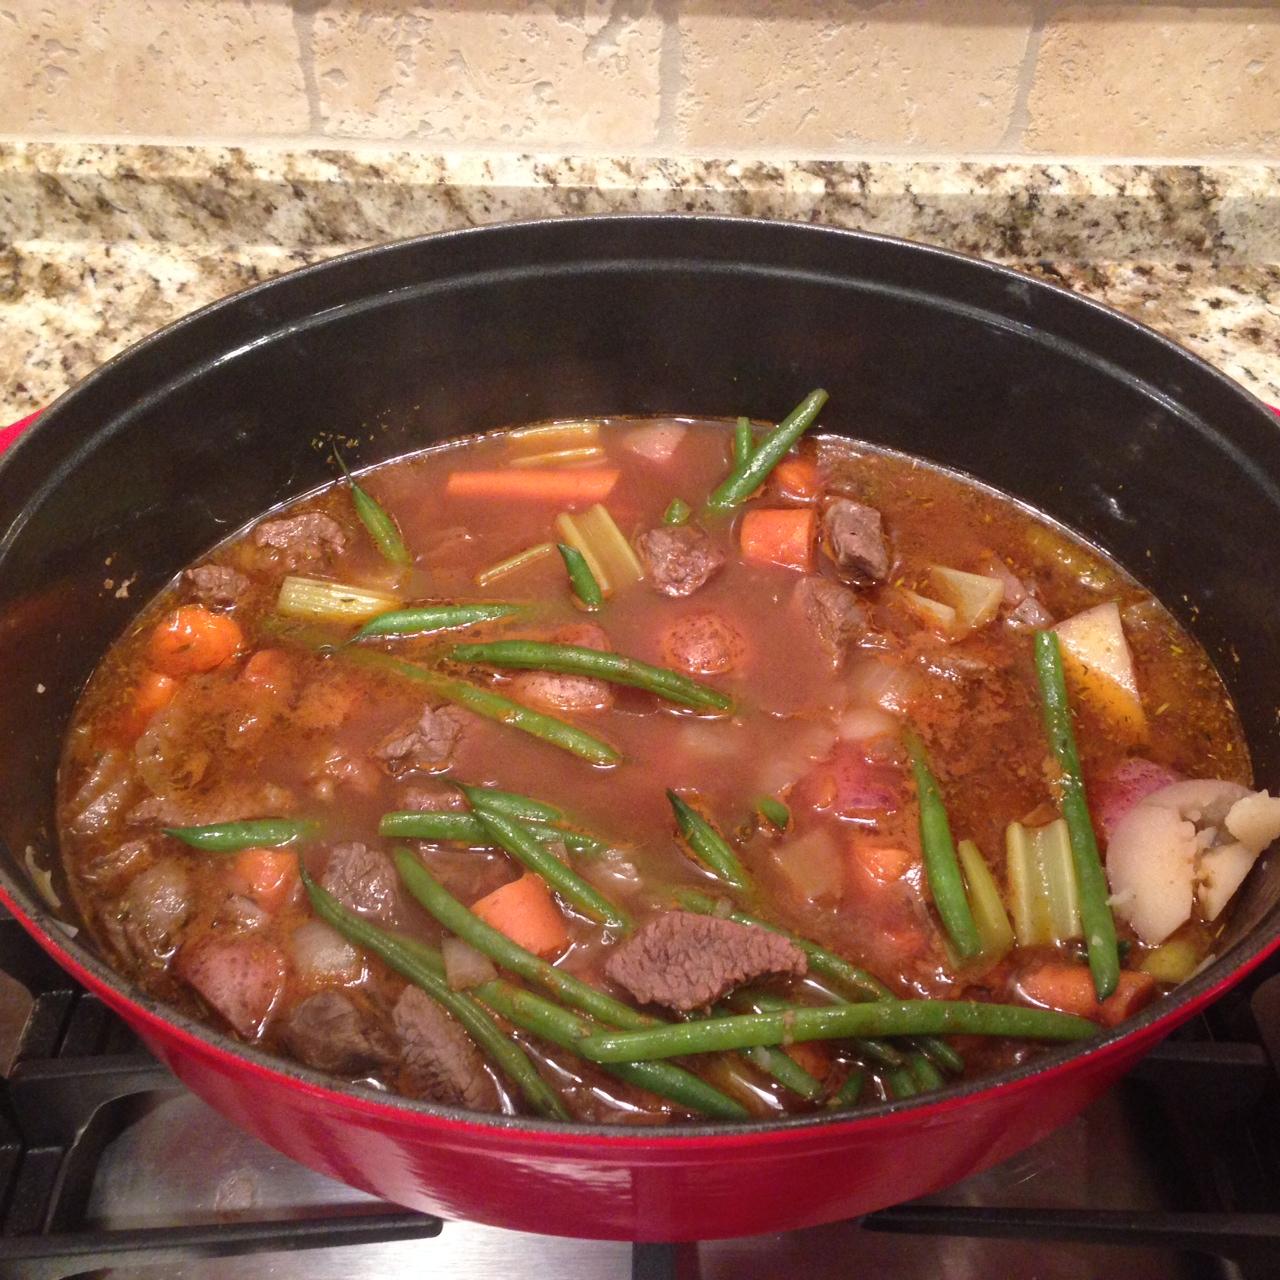 091614 Beef Stew 1